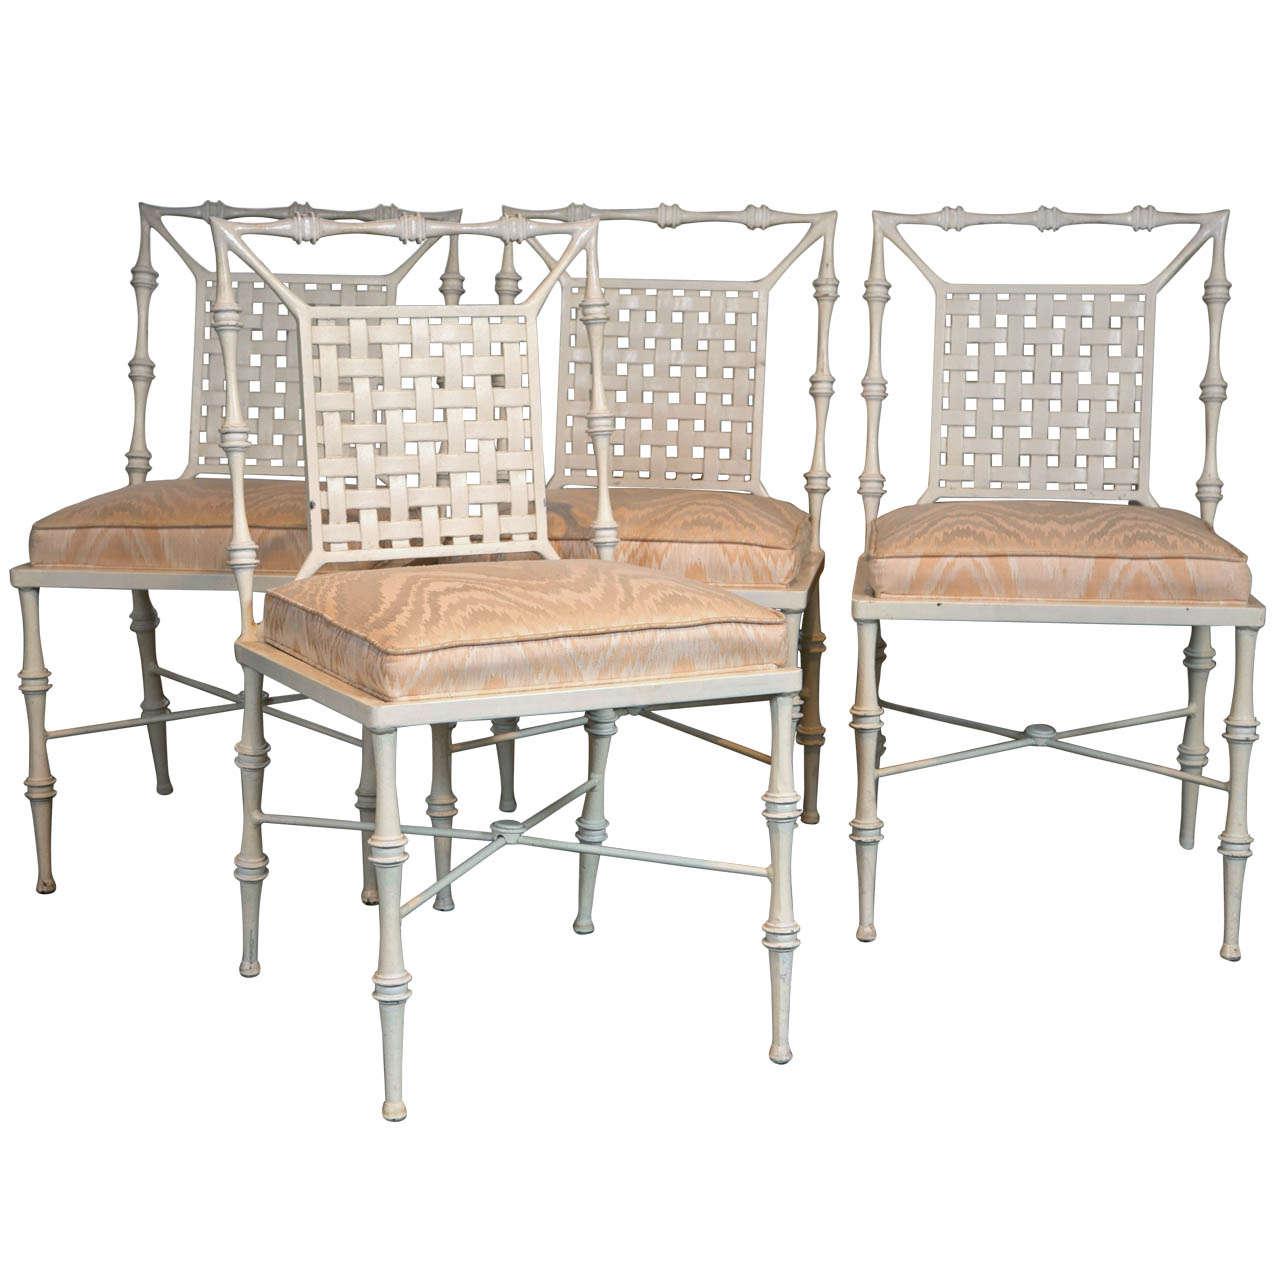 Beautiful ... Great Brown Jordan Outdoor Furniture Prices Part 27